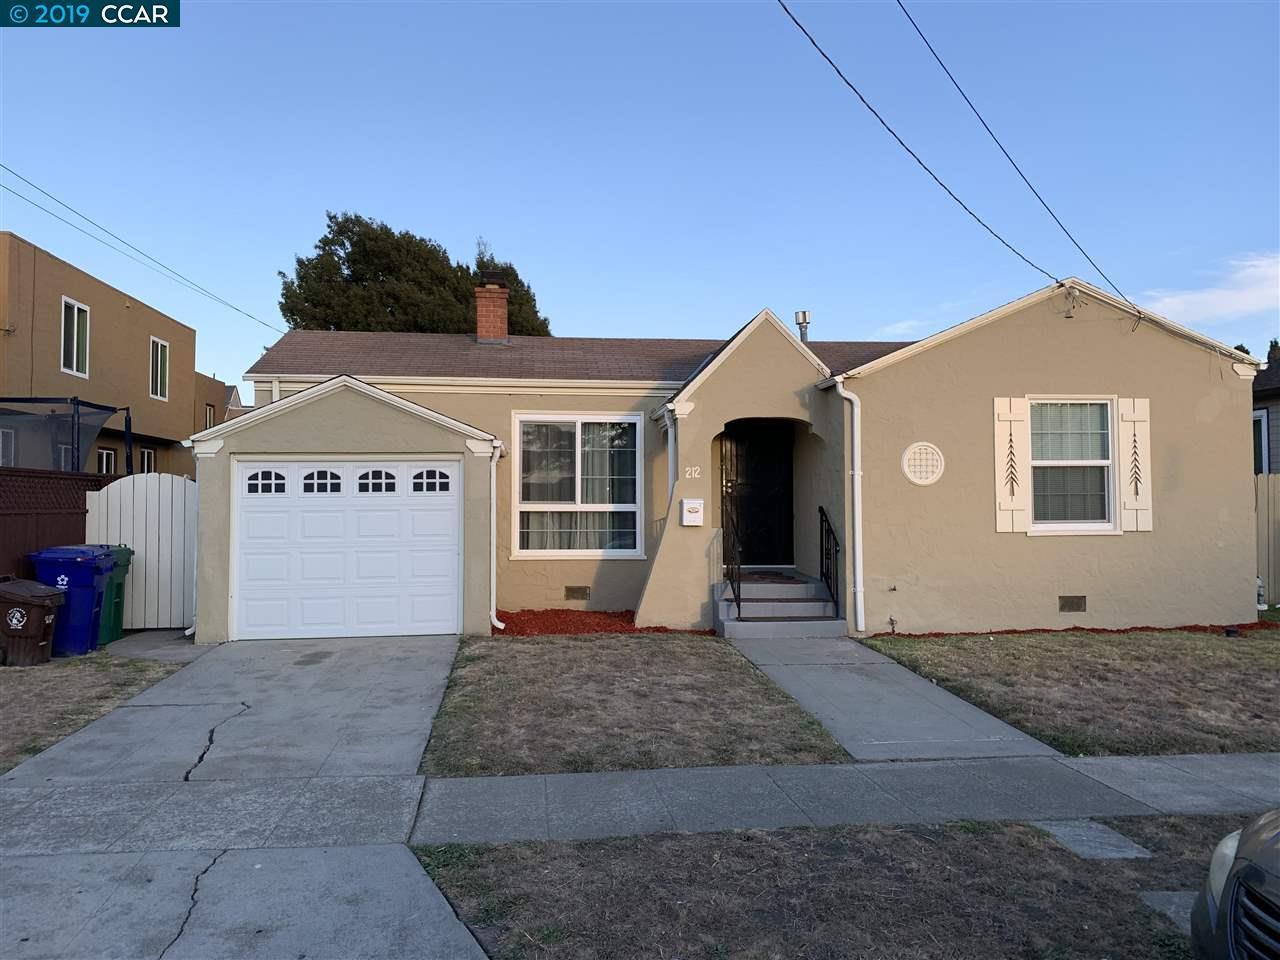 212 S. 22ND ST,, RICHMOND, CA 94804